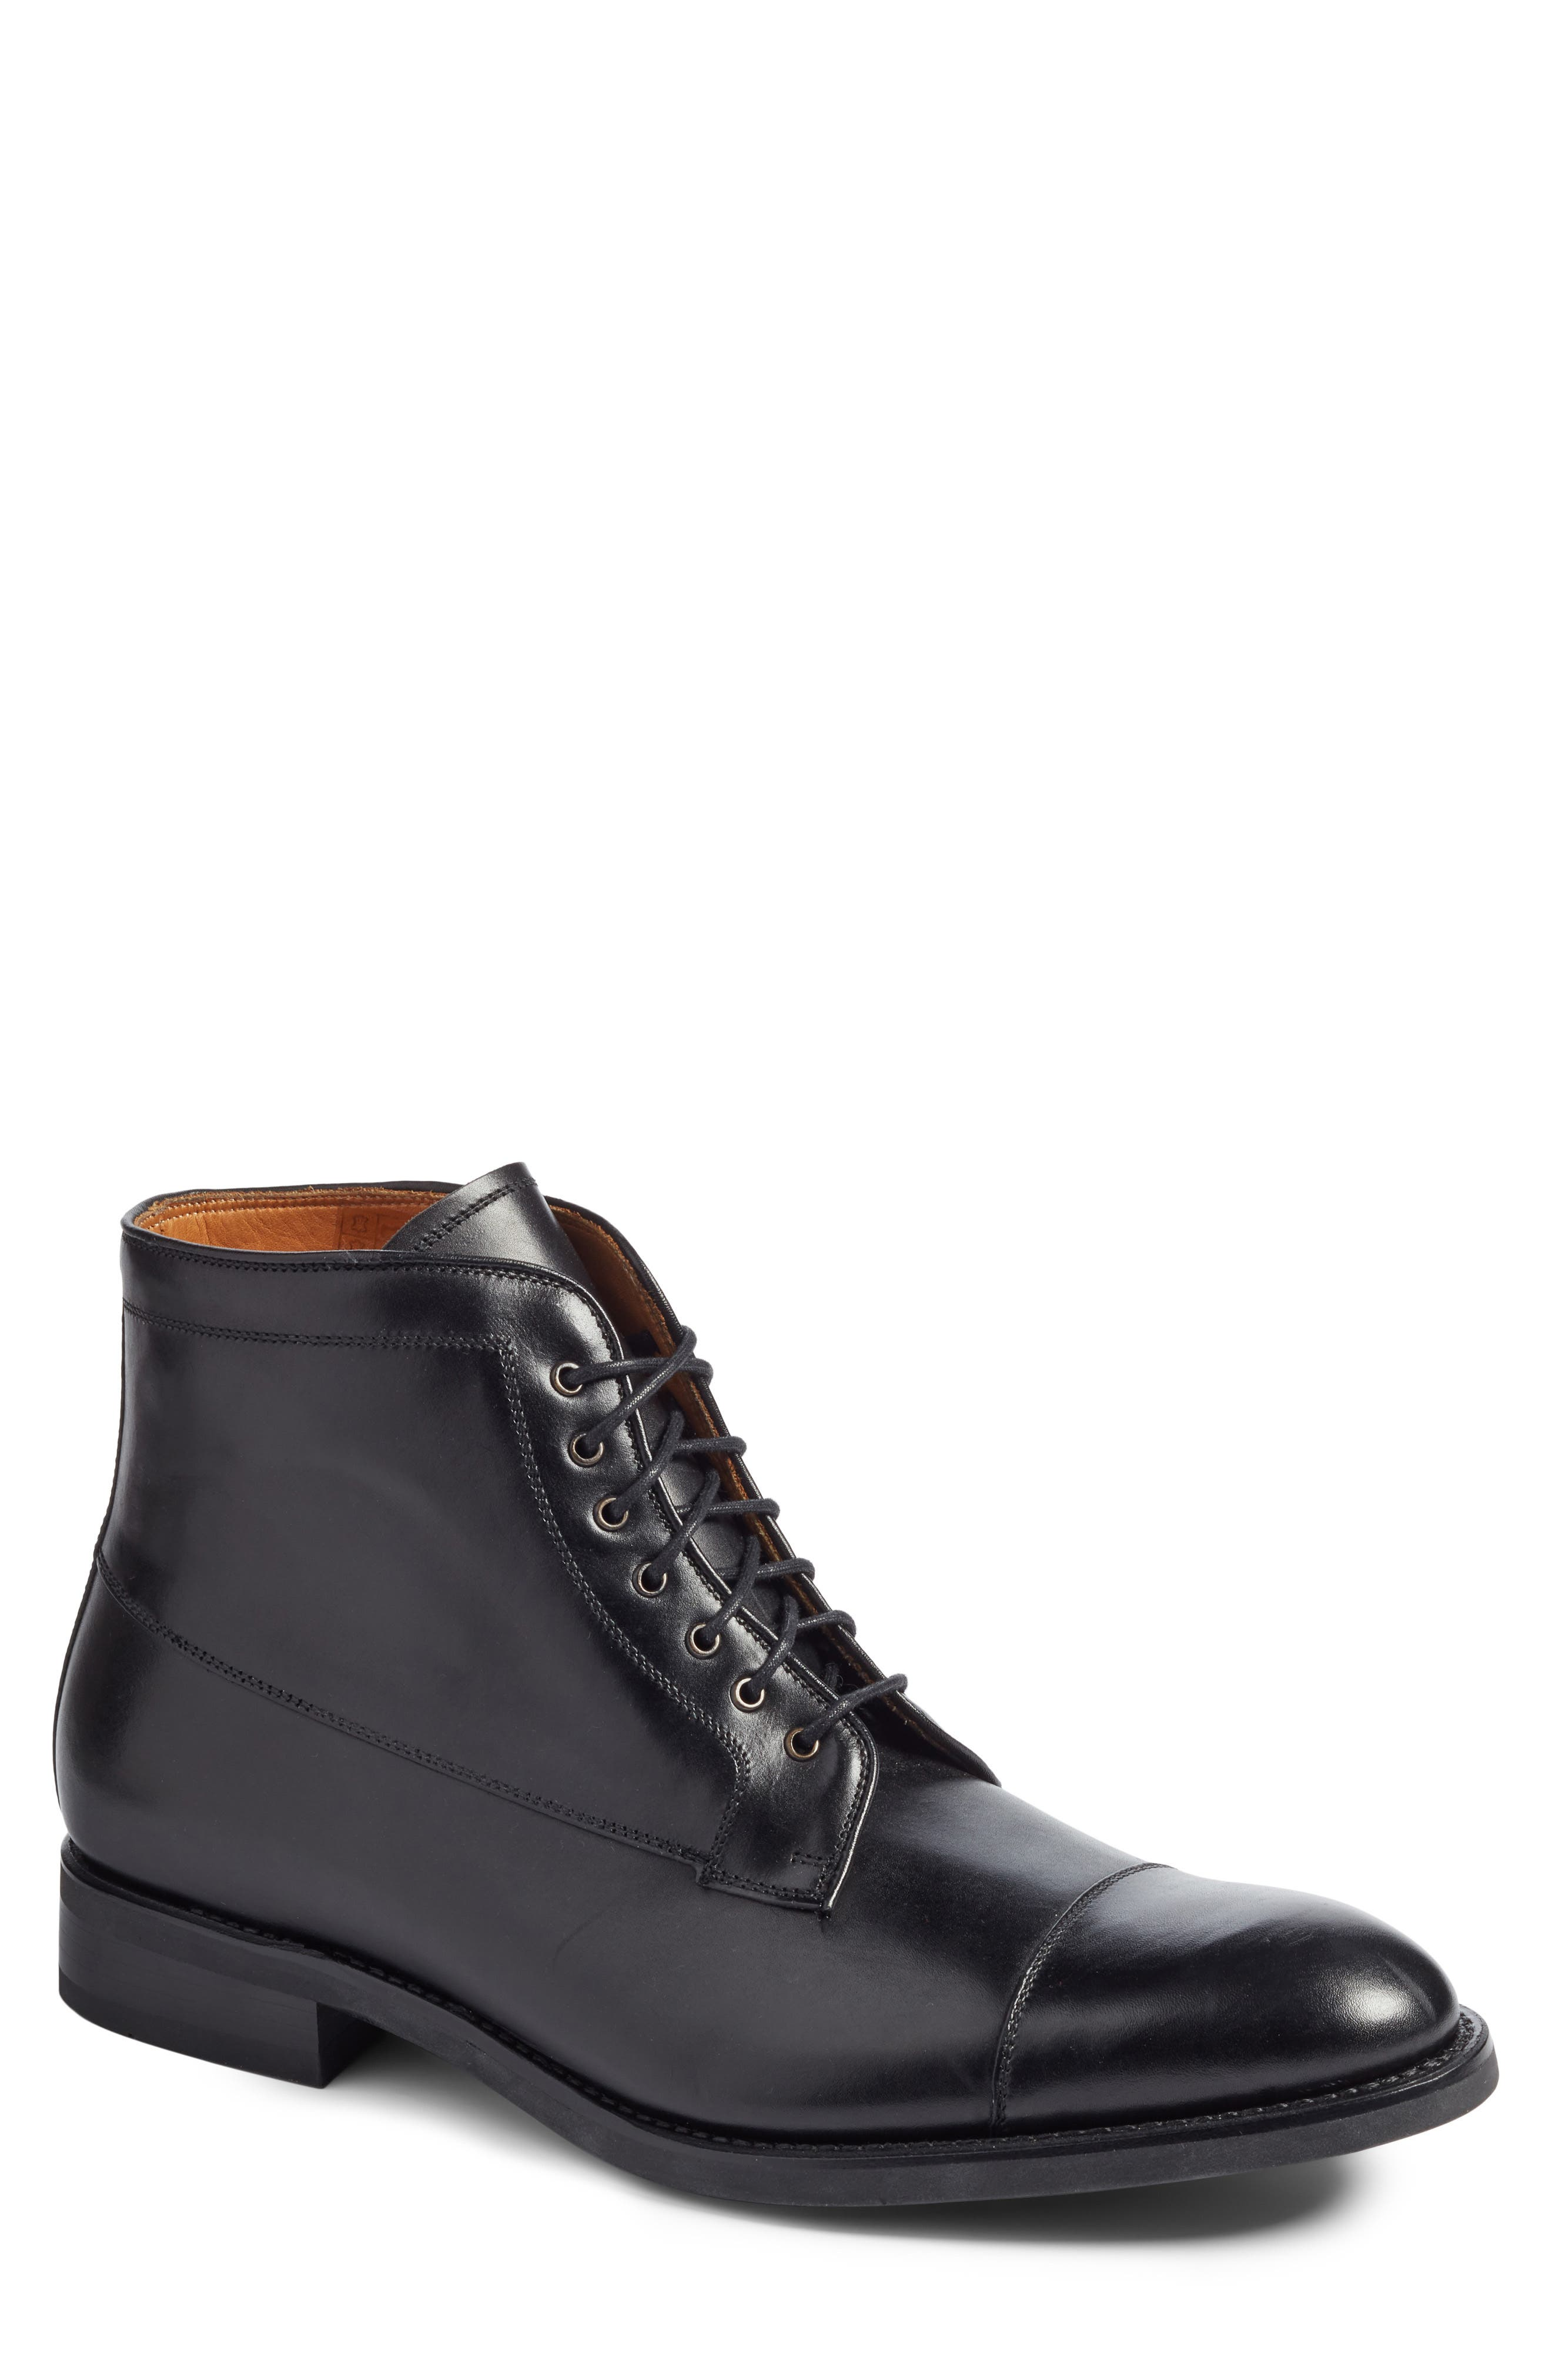 Chester Cap Toe Boot,                             Main thumbnail 1, color,                             Black Leather